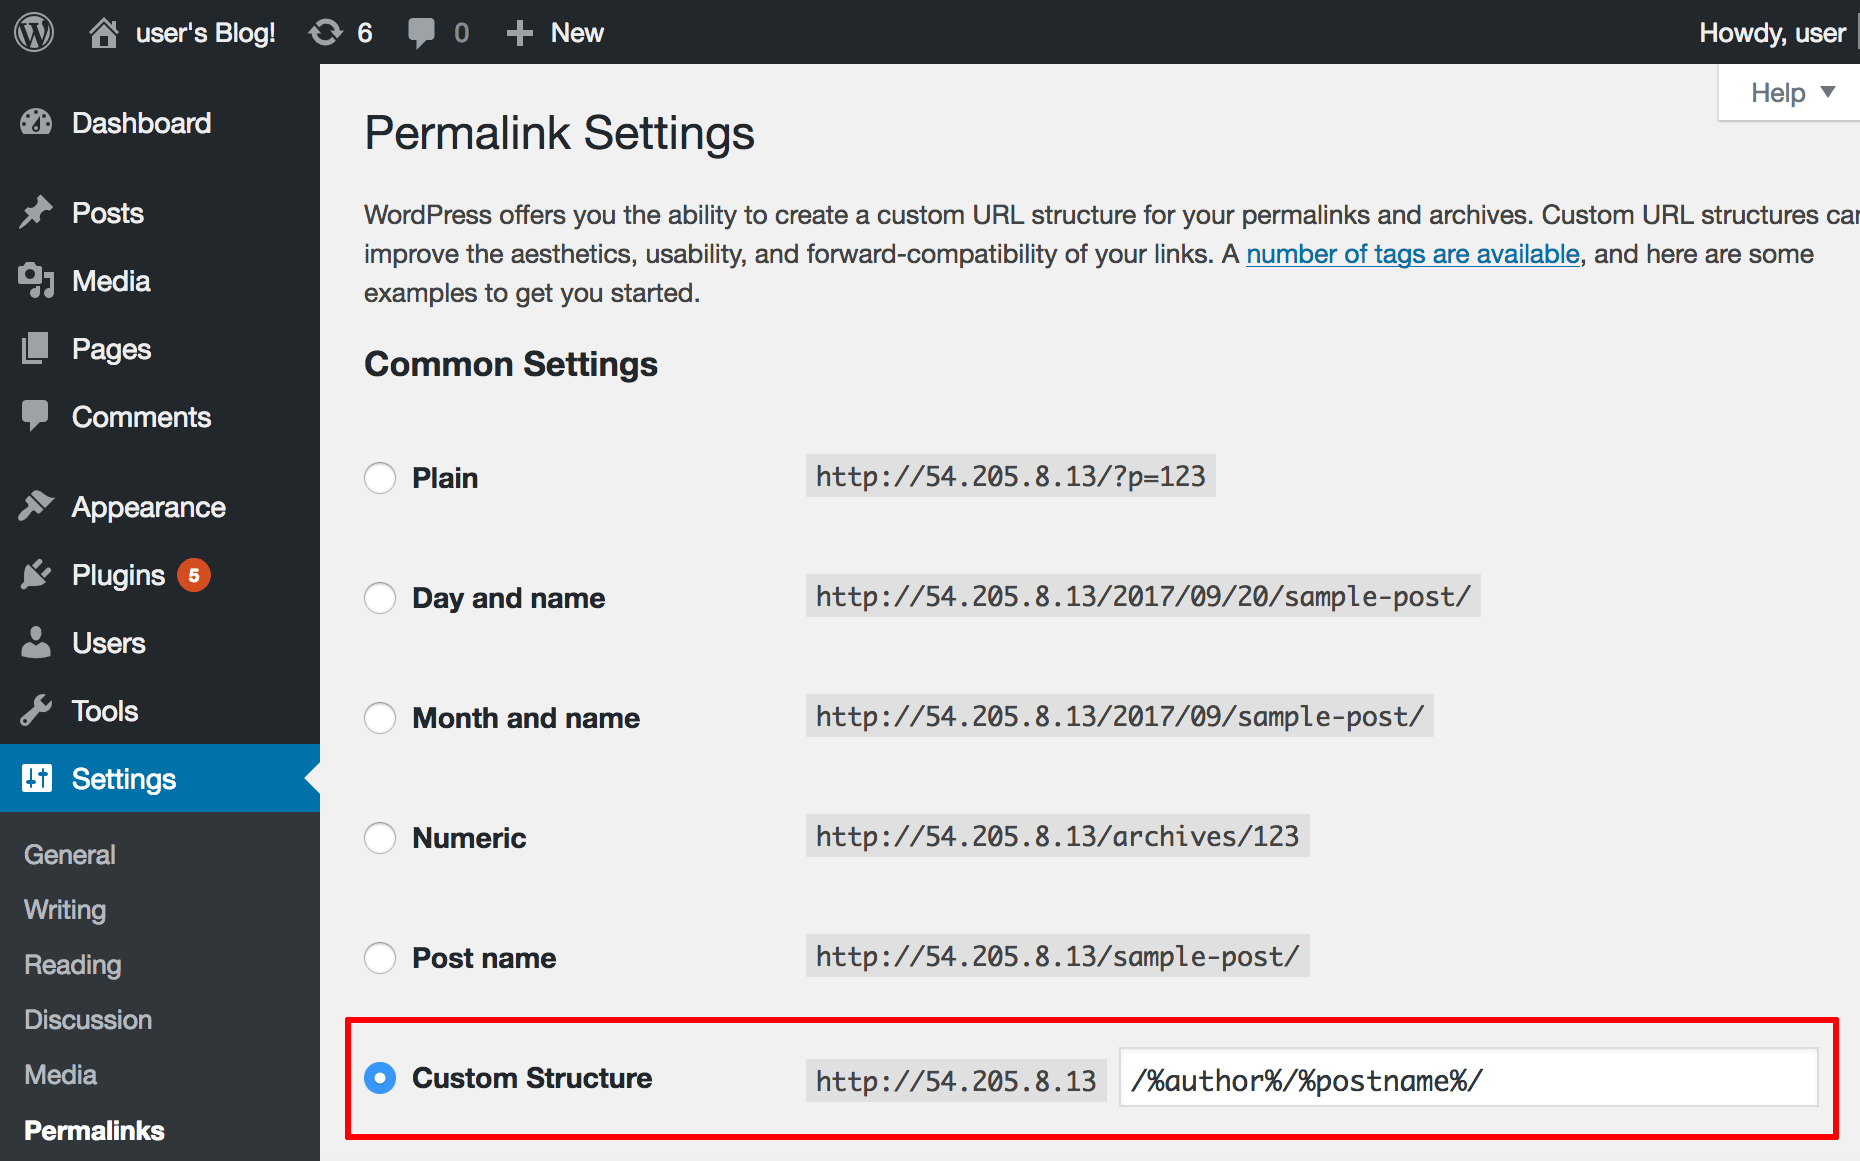 Permalink customization